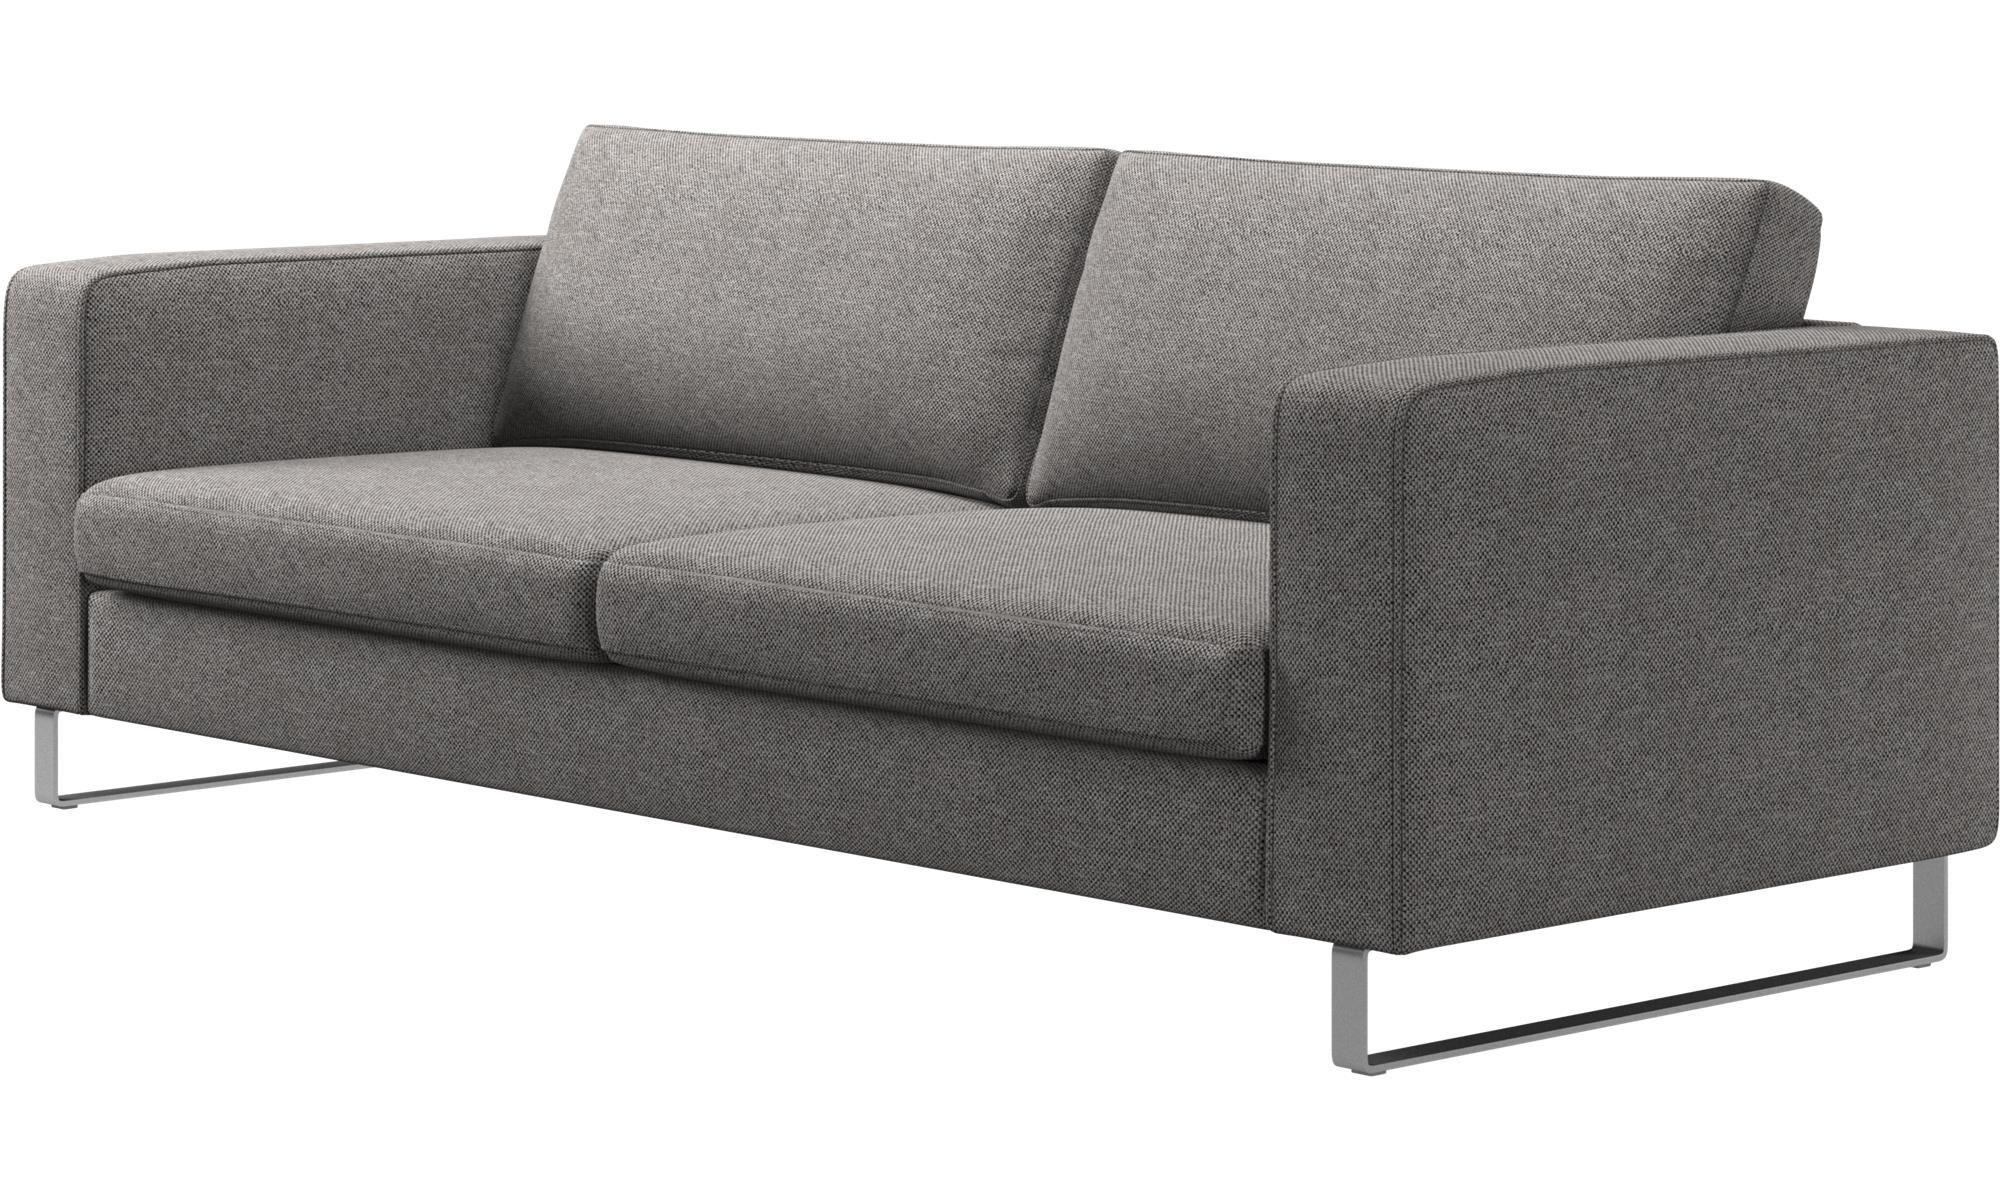 3 Sitzer Sofas   Indivi 2 Sofa   Grau   Stoff